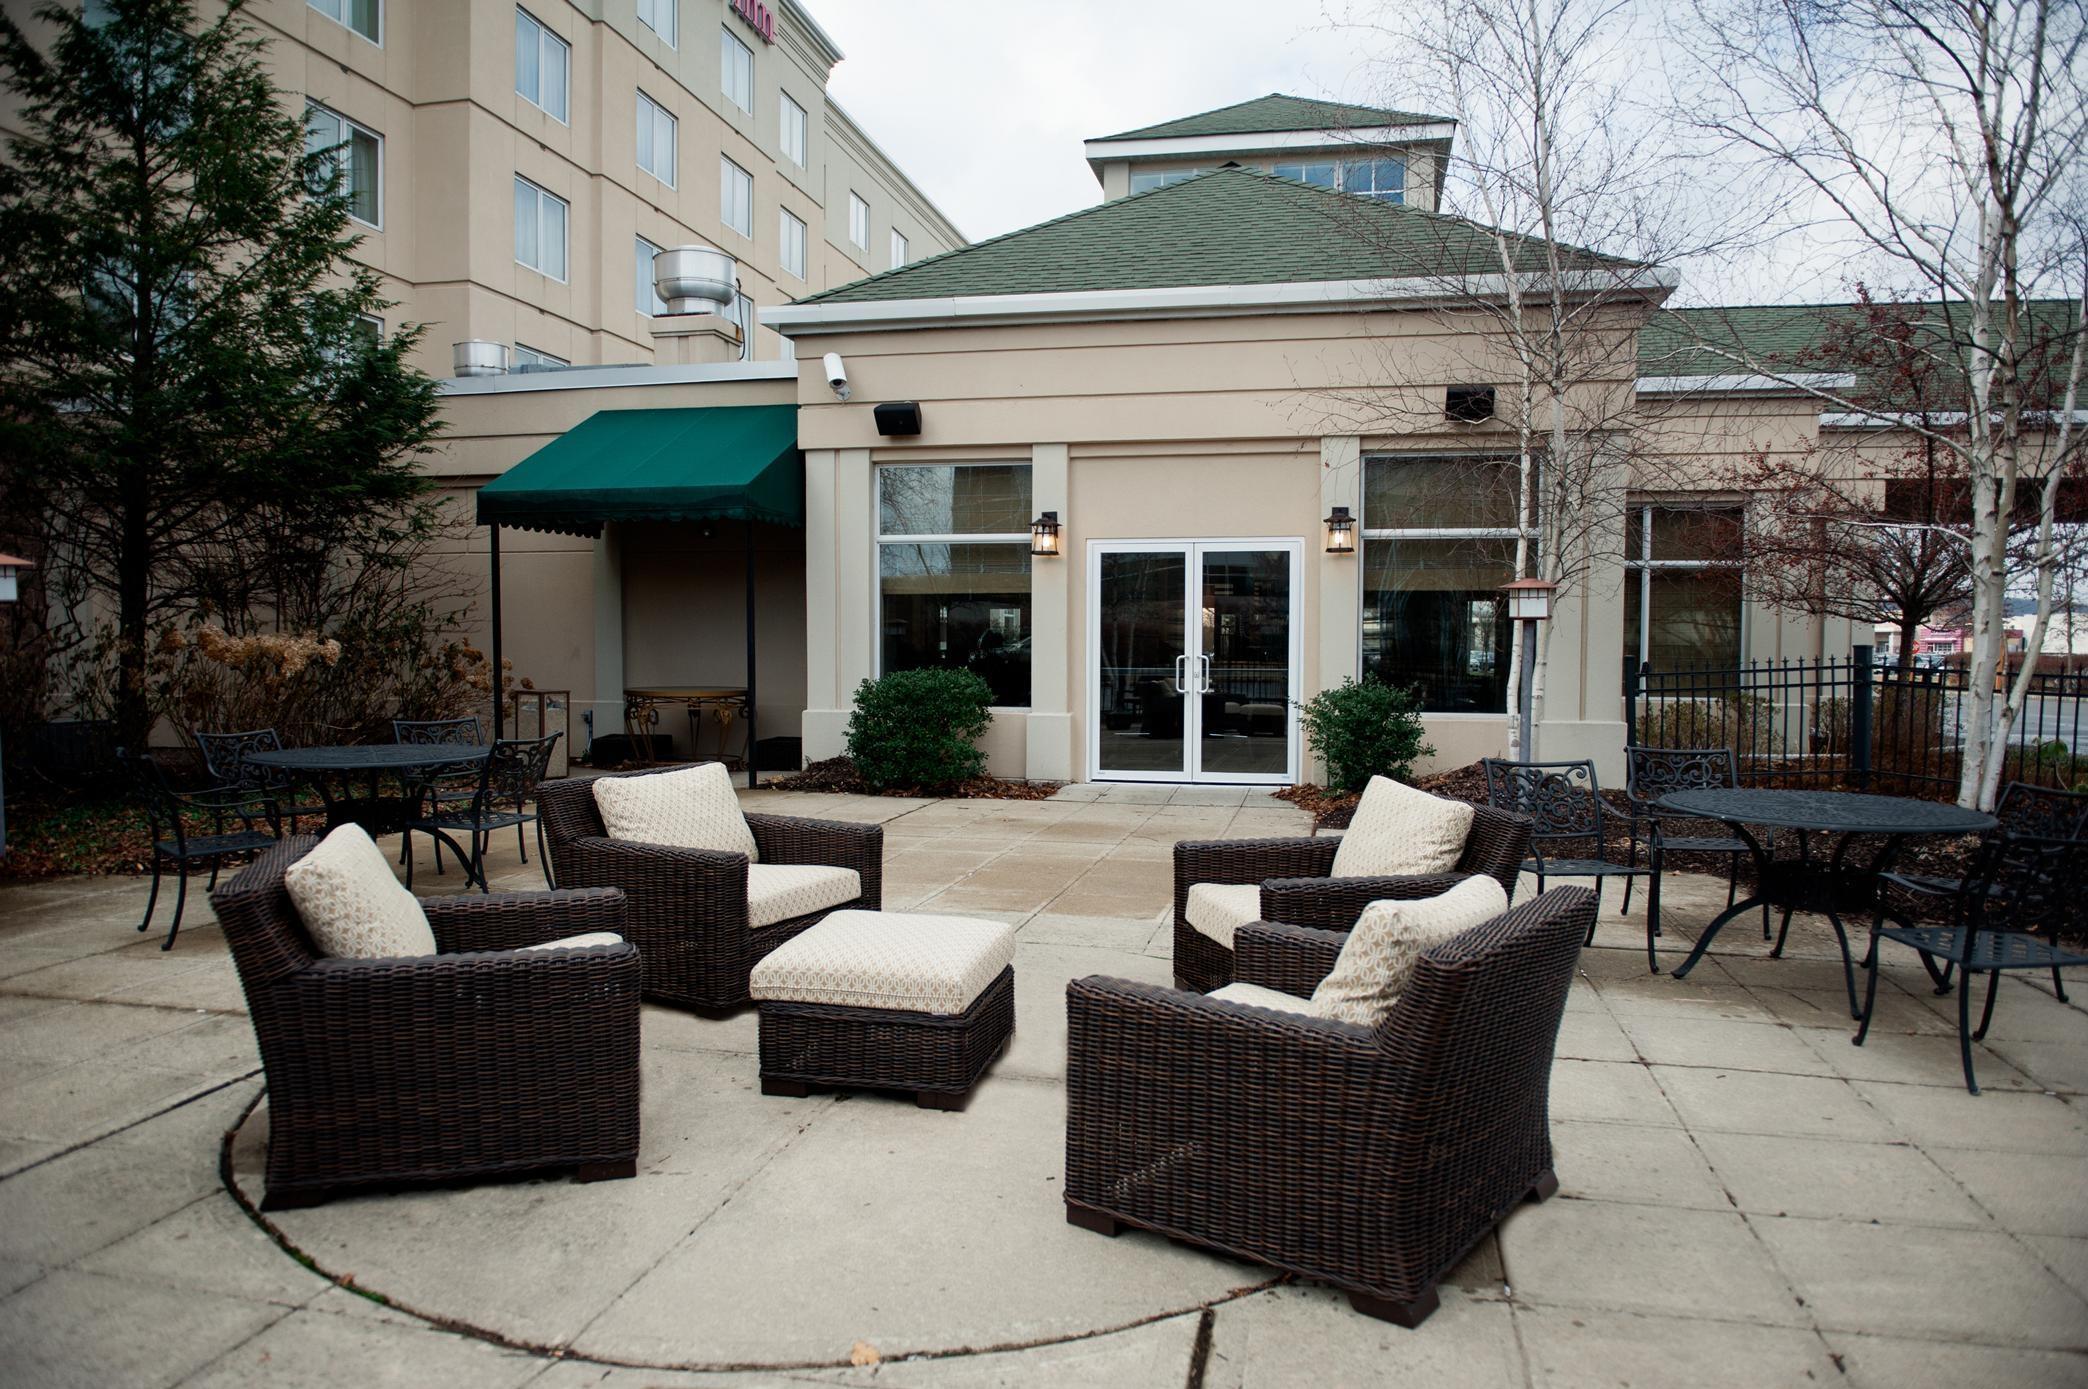 Hilton Garden Inn Rockaway image 9